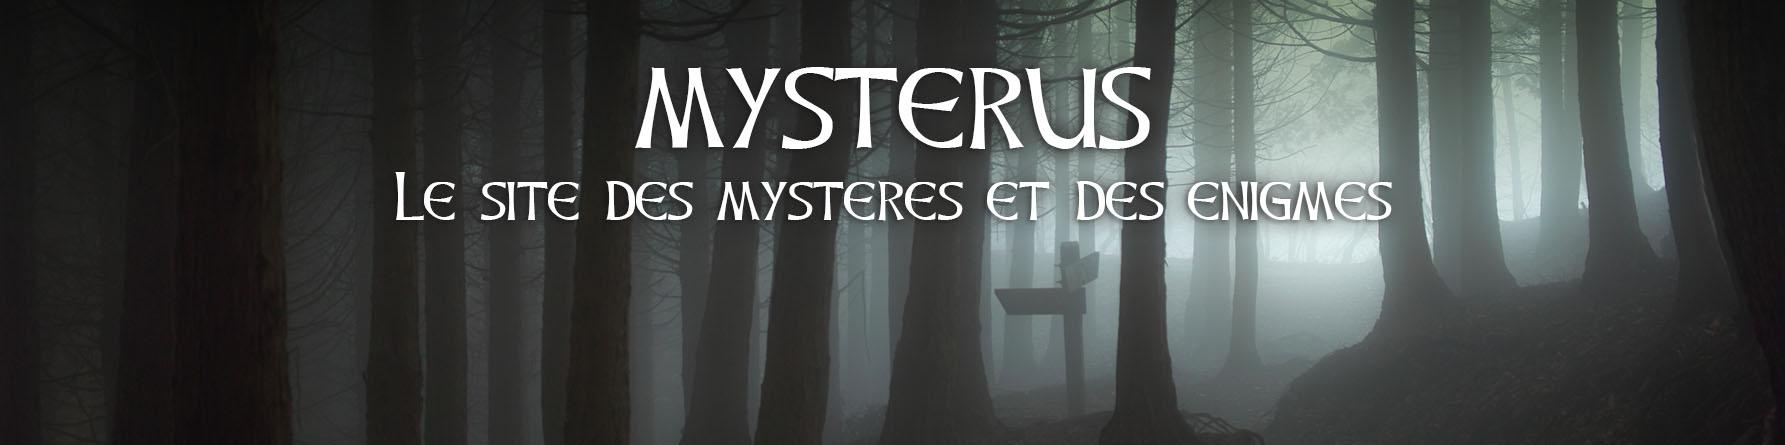 Mysterus.FR